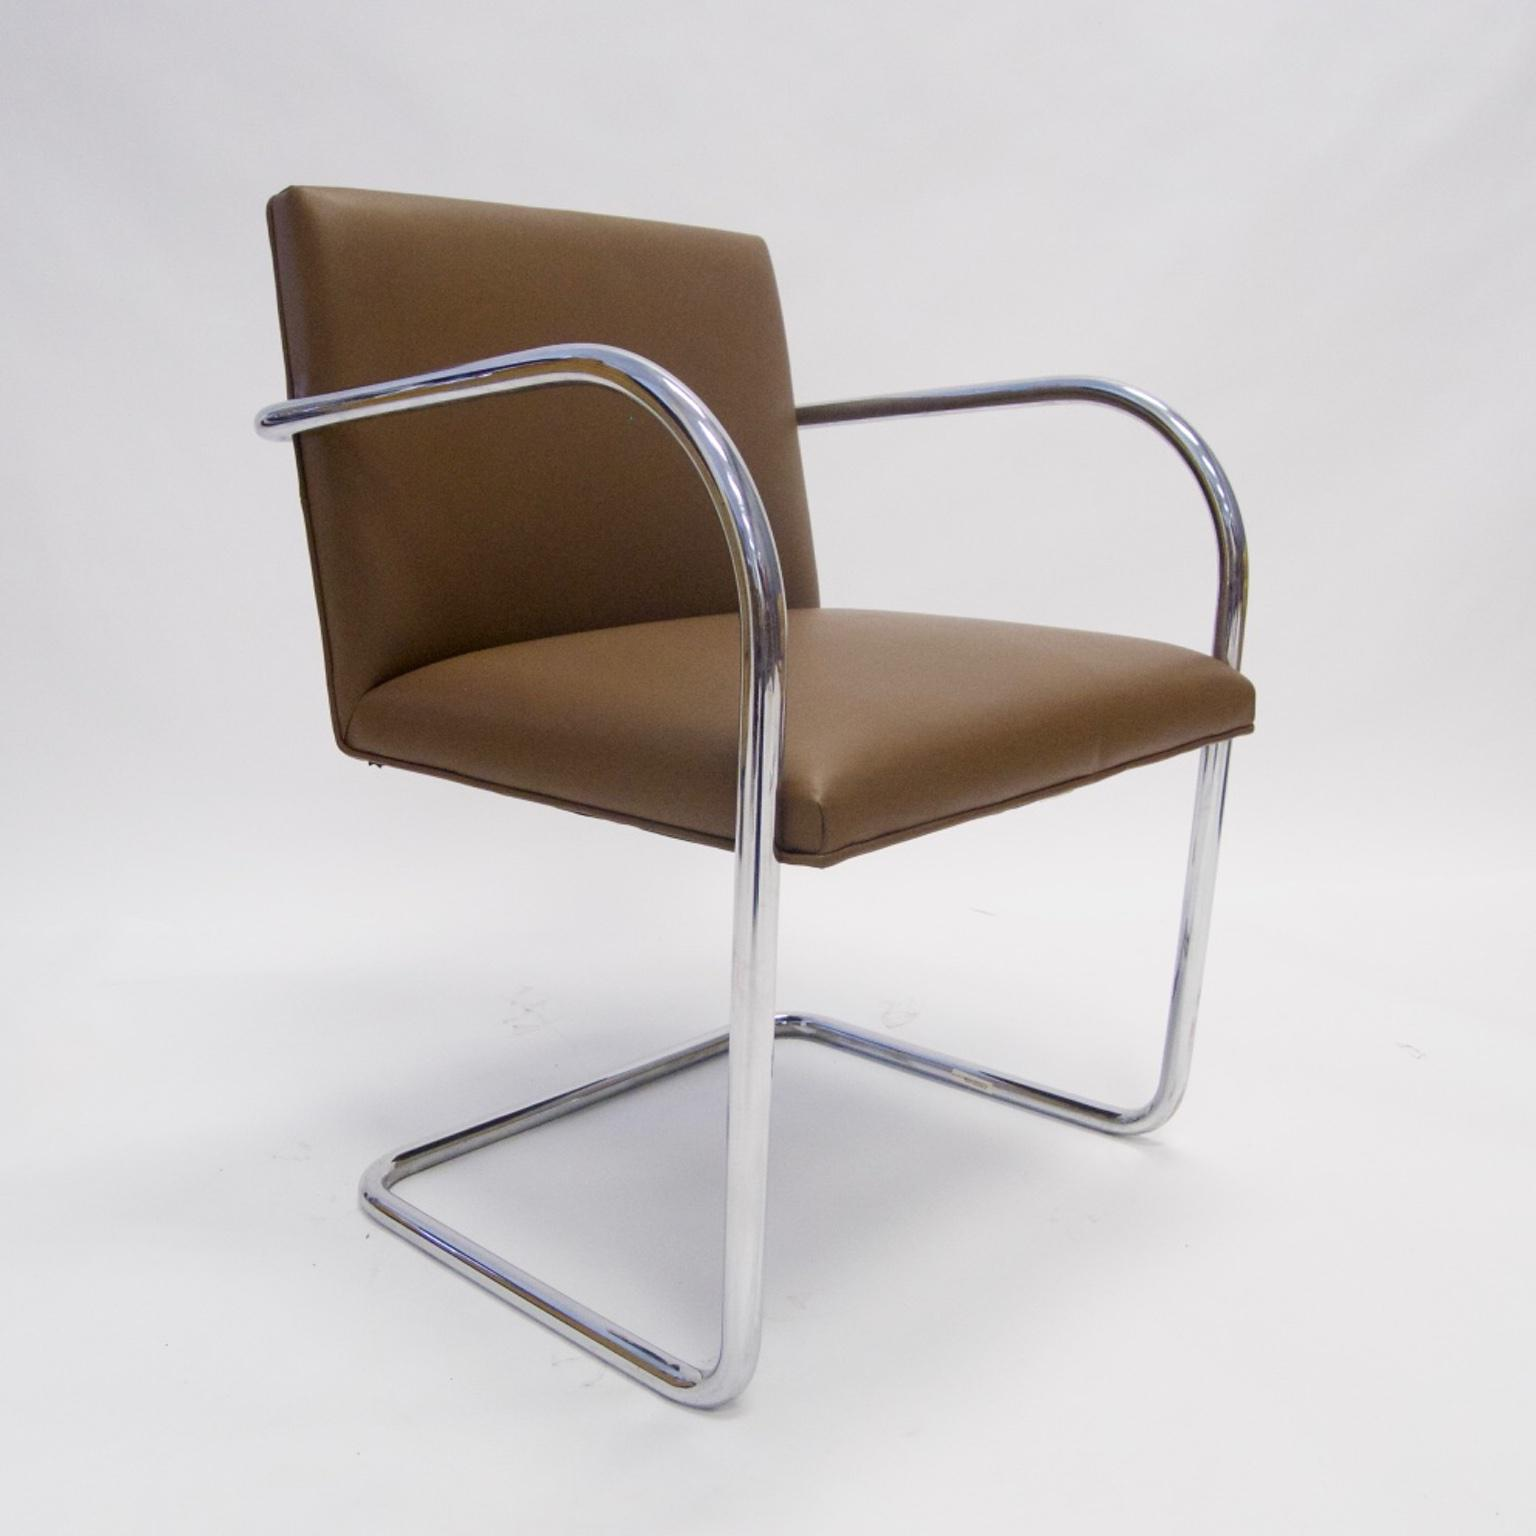 Mies Brno Chair knoll mies van der rohe brno chair in saddle leather | chairish